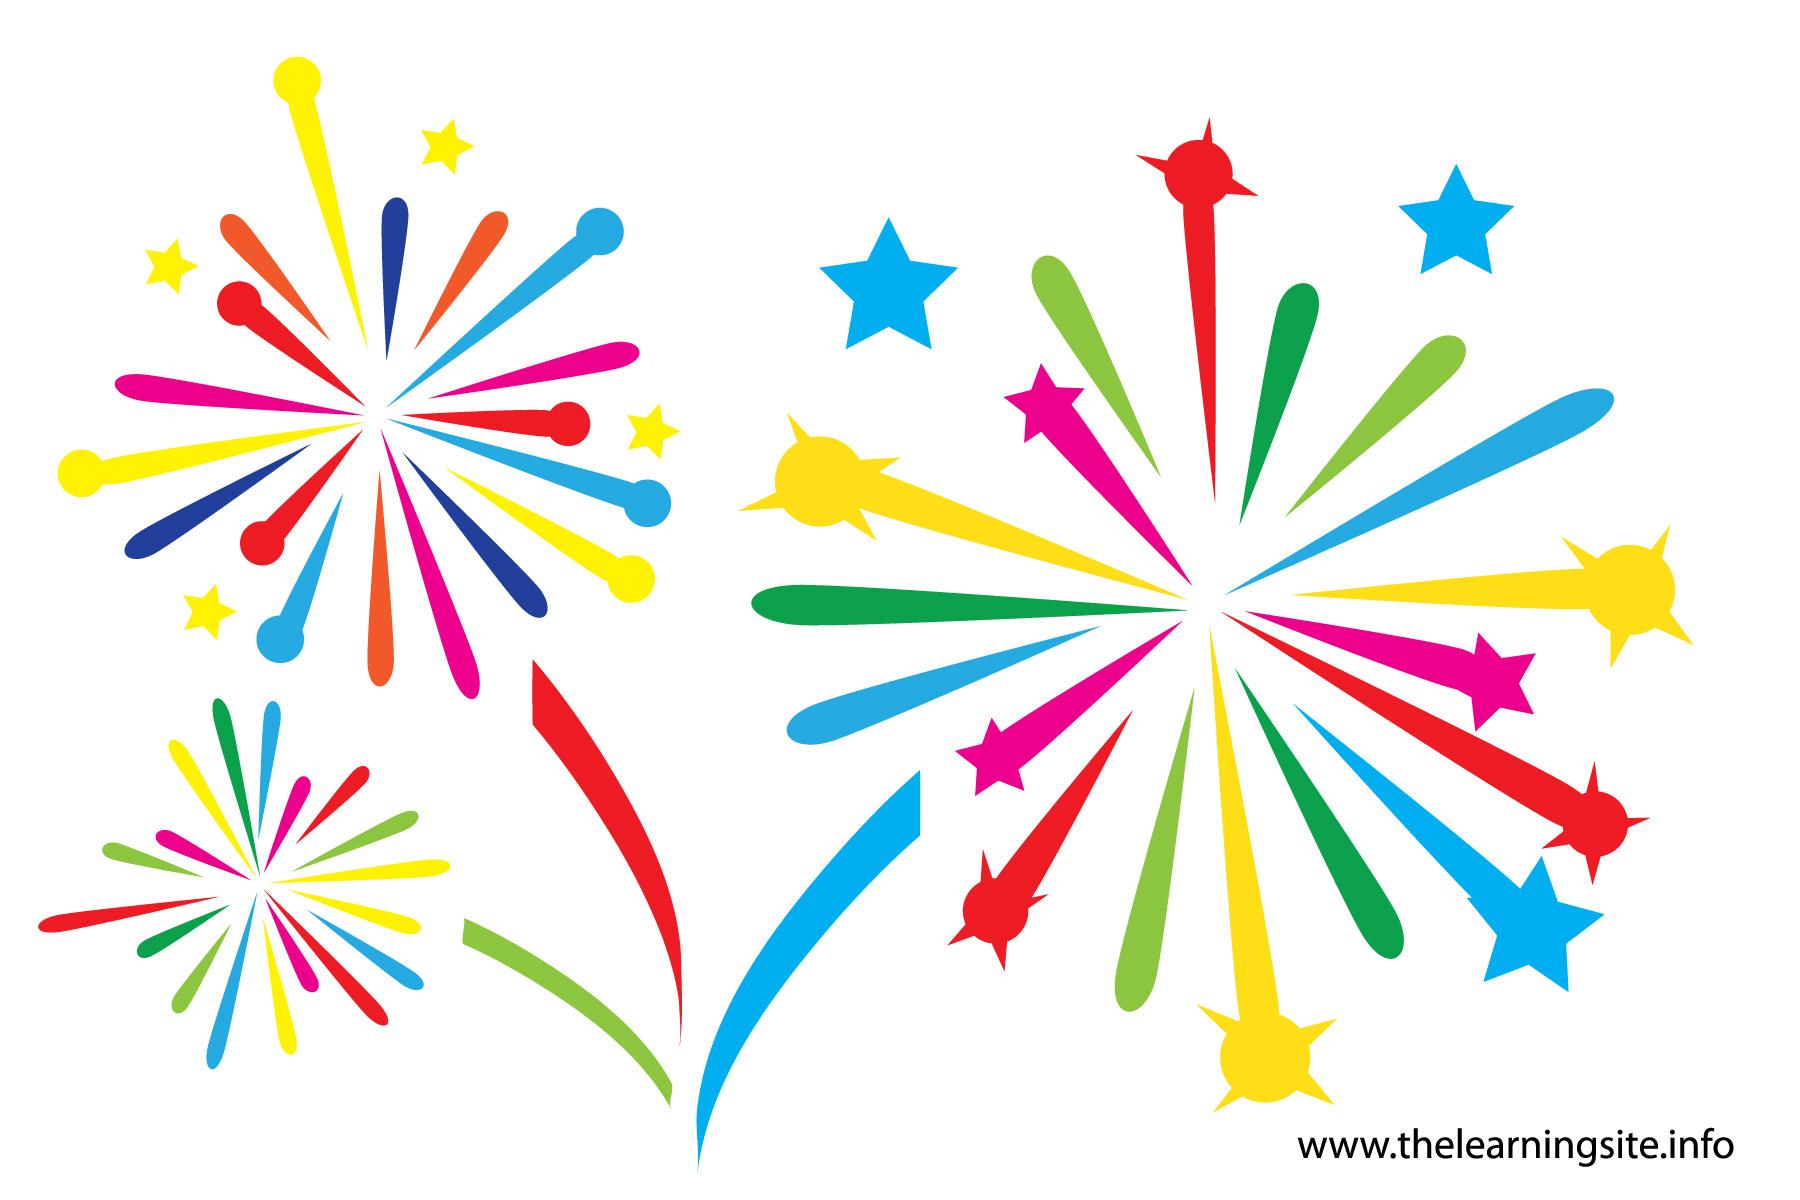 Clip Art Fireworks Clipartfox 2-Clip art fireworks clipartfox 2-3